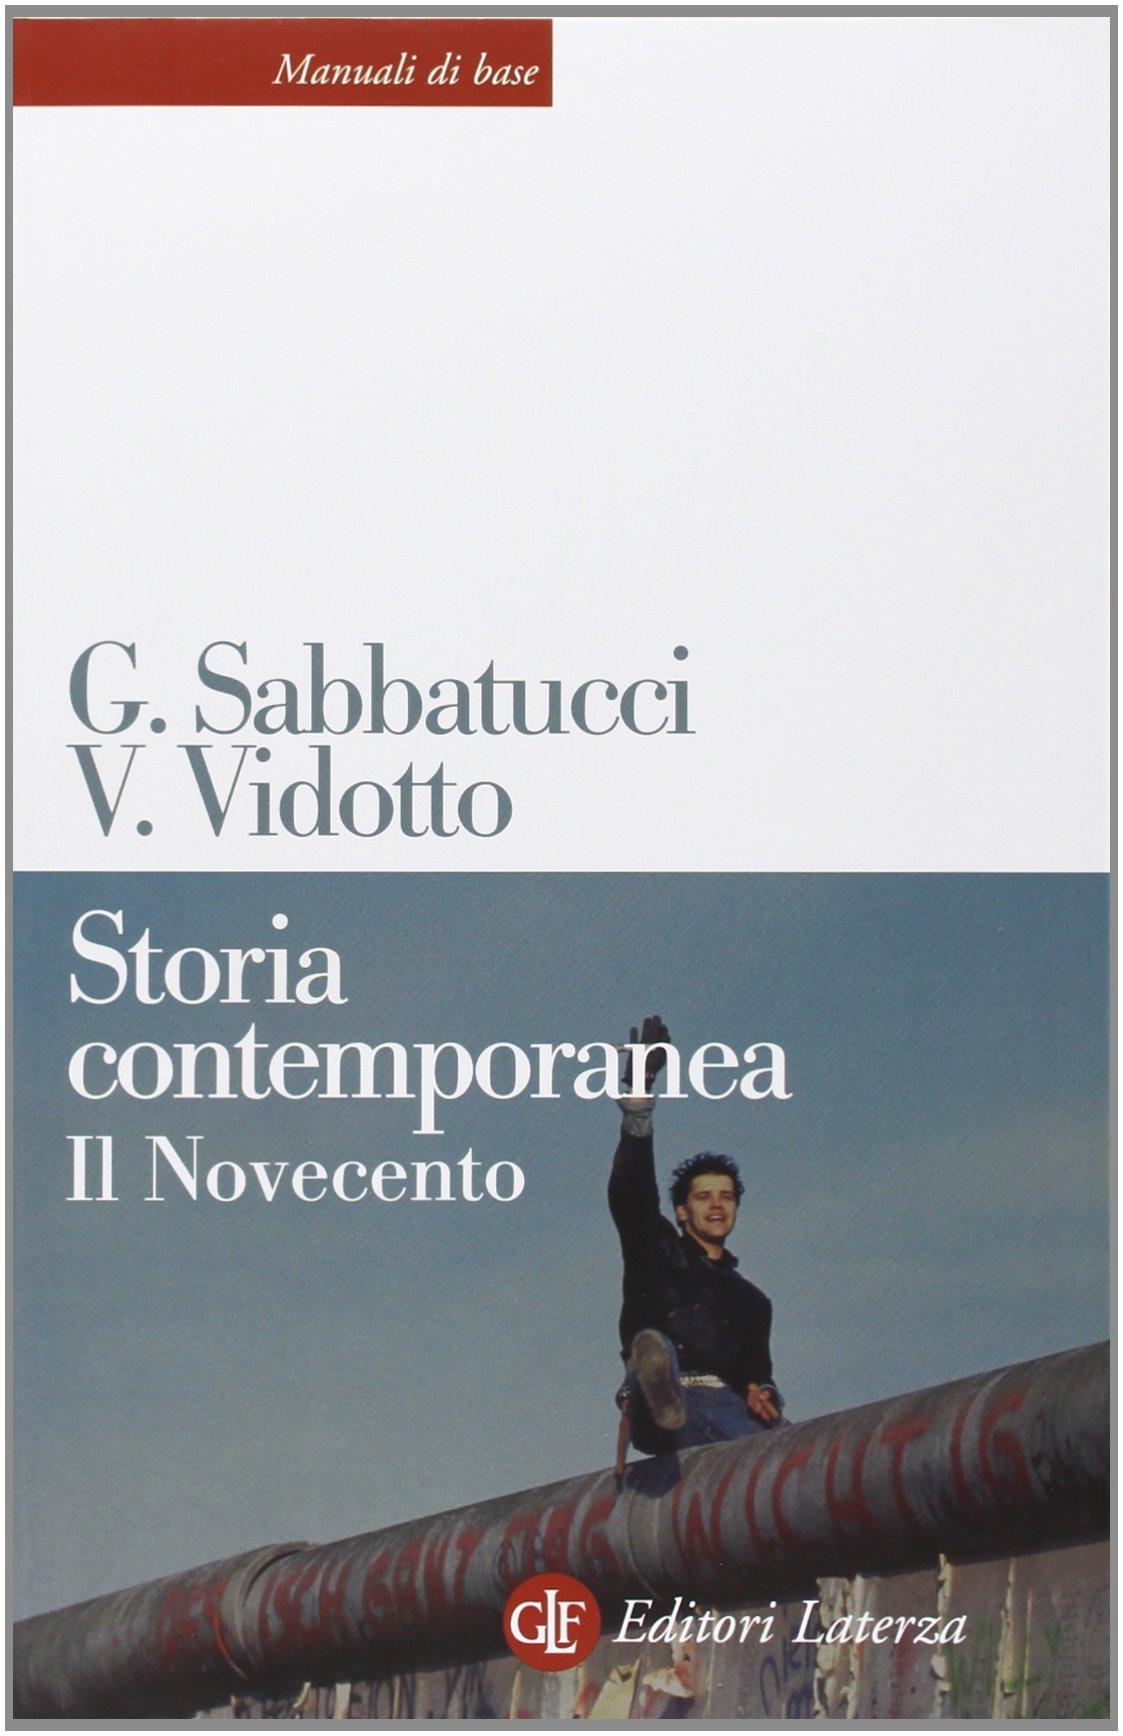 sabatucci vidotto storia contemporanea  Storia contemporanea. Il Novecento: : Giovanni Sabbatucci ...